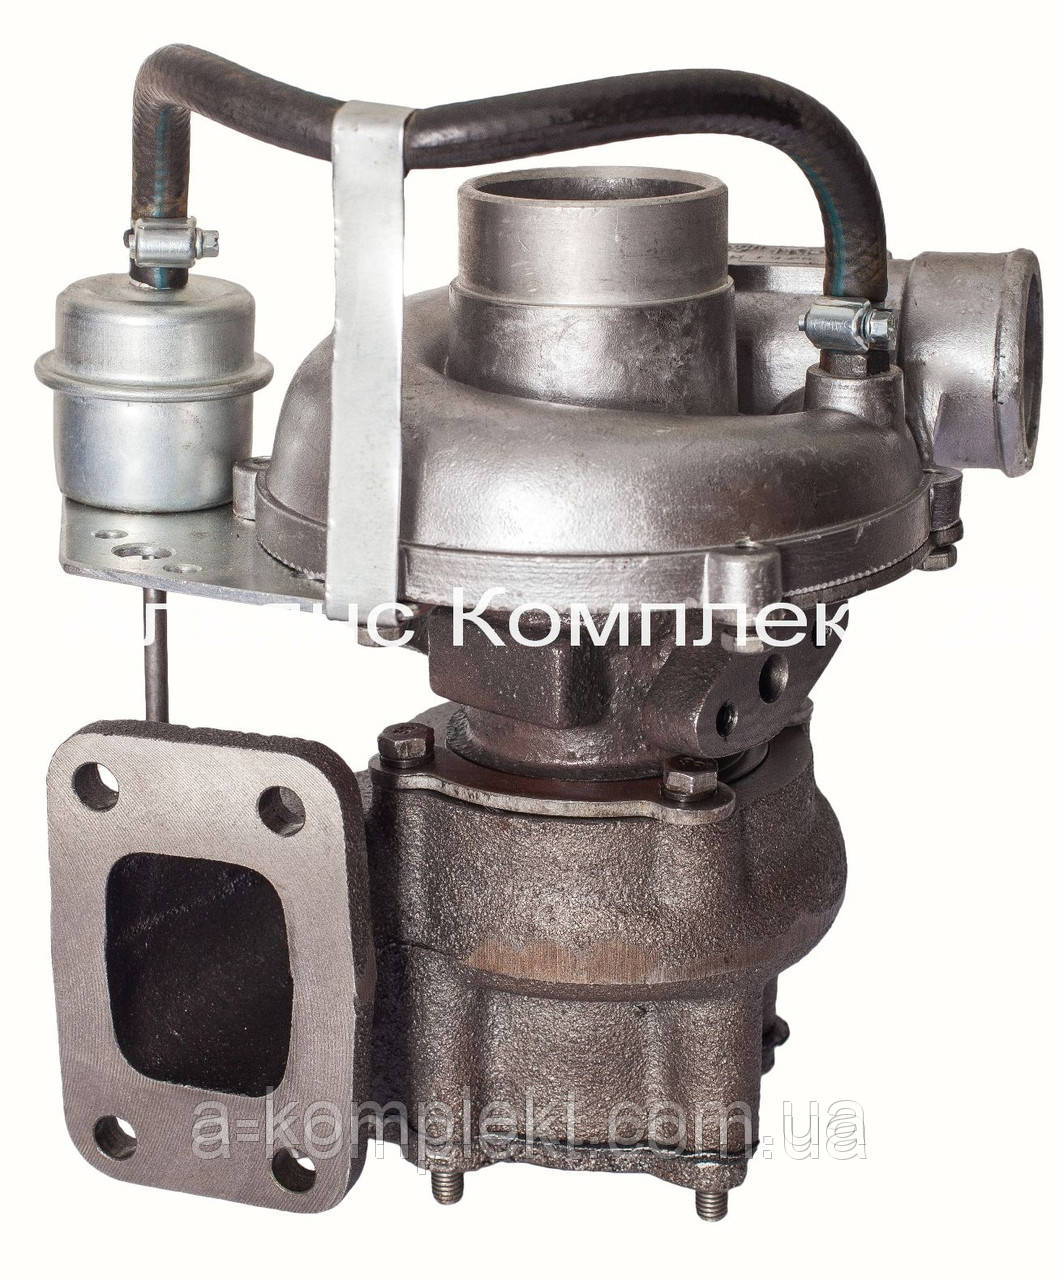 Турбокомпрессор ТКР 6.1 - 02 с клапаном (620.000-02)